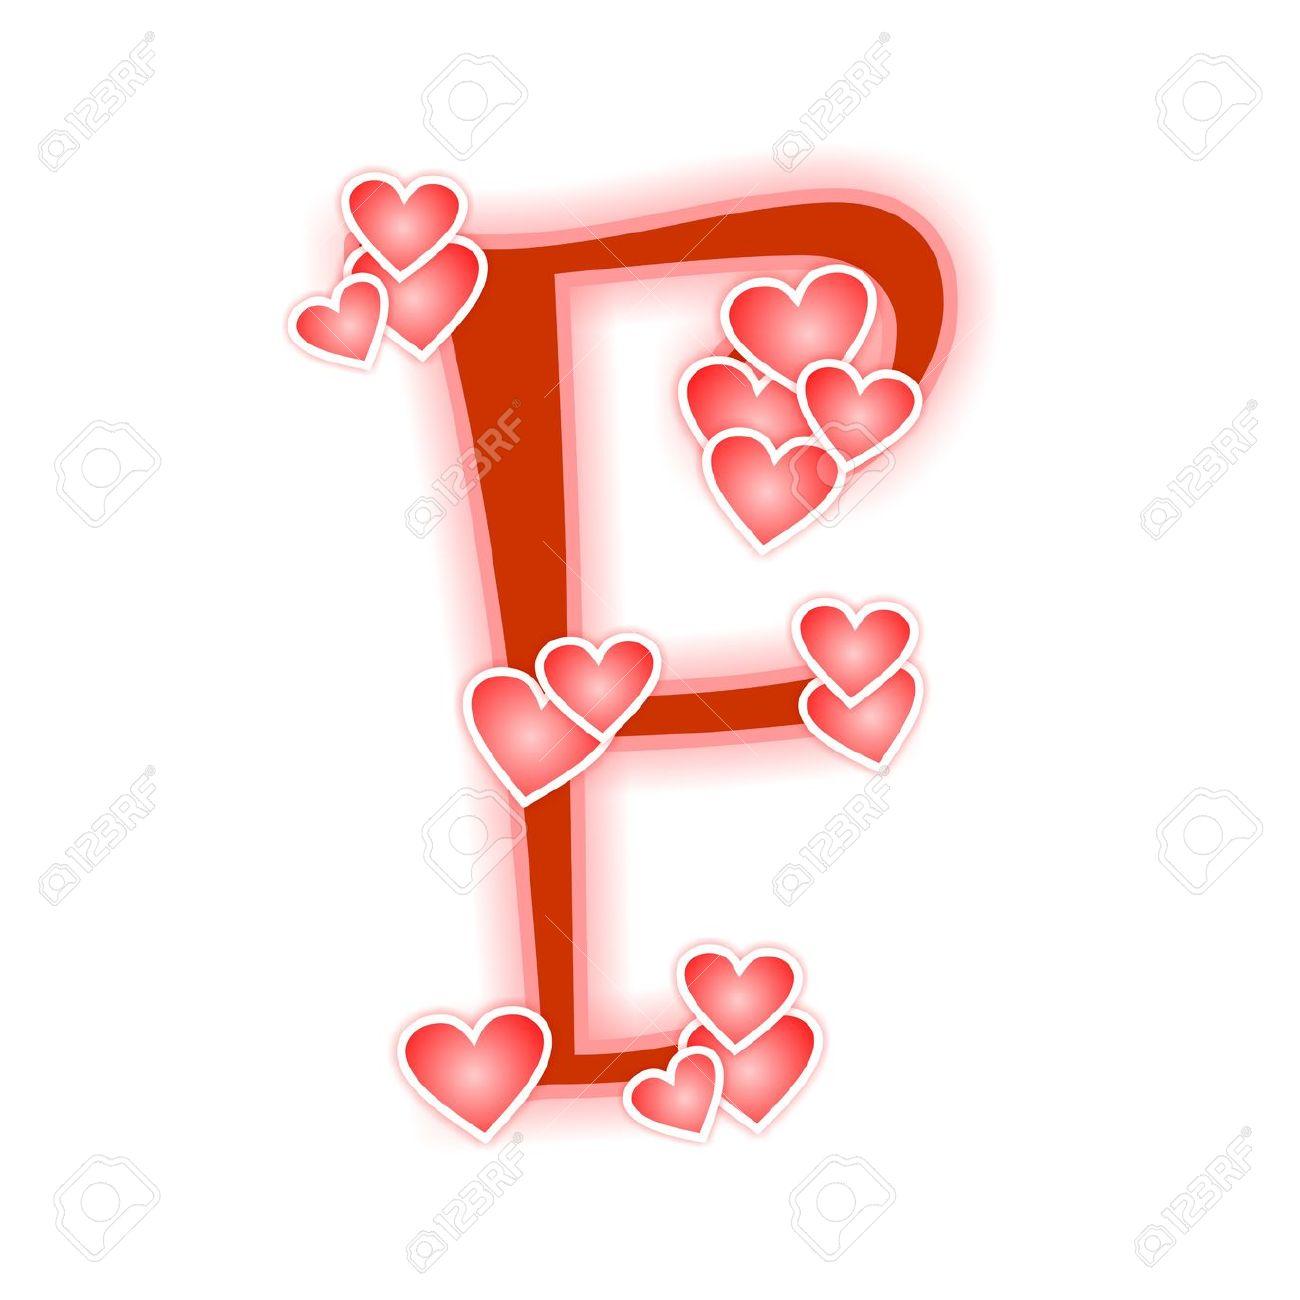 Love letter alphabet f stock photo picture and royalty free image love letter alphabet f stock photo 20756184 altavistaventures Images